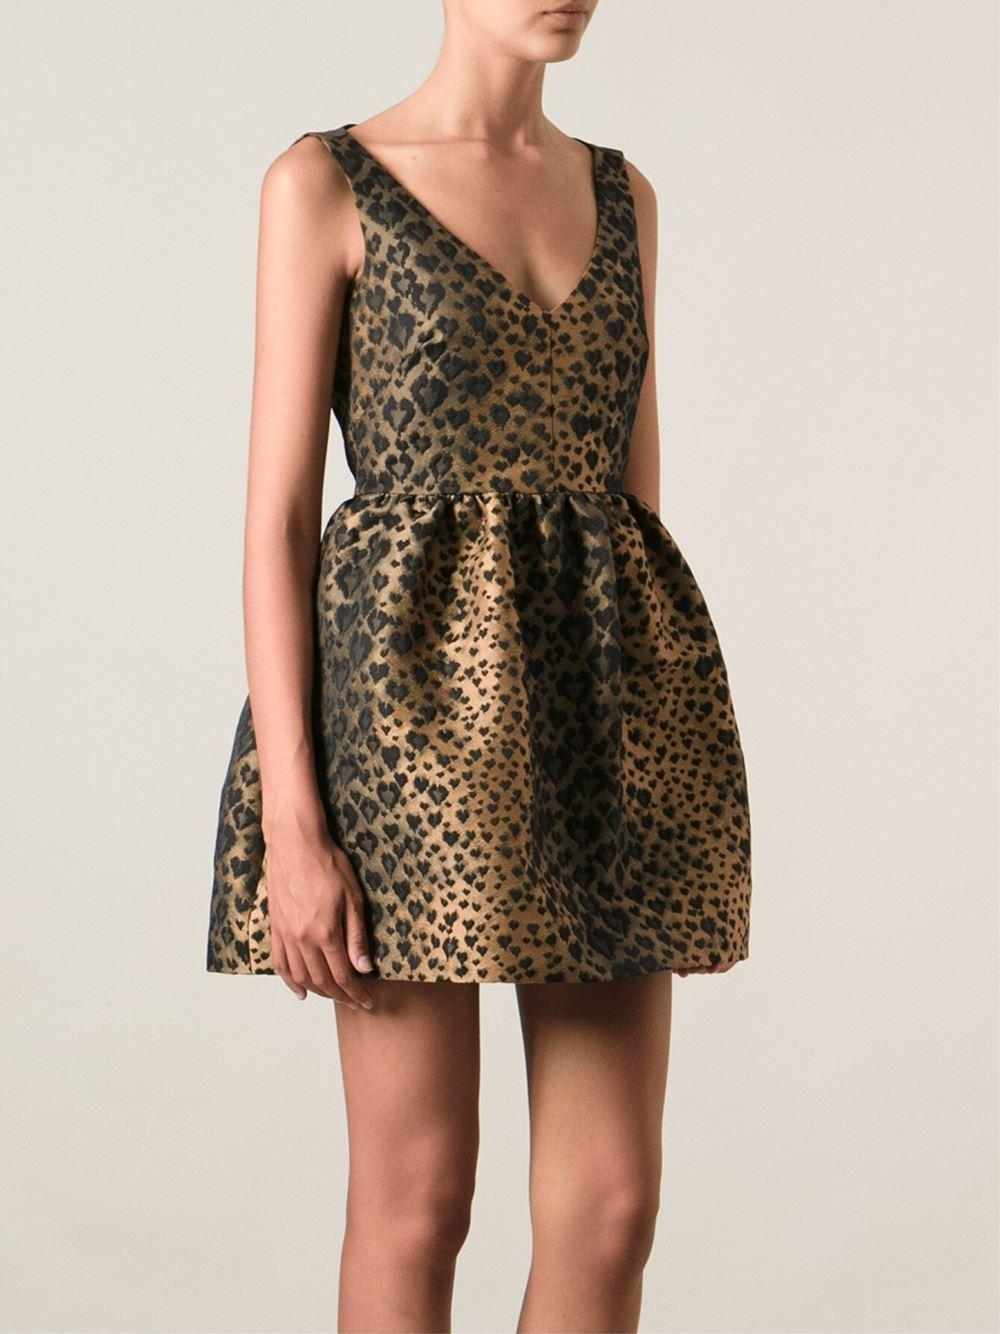 272e4724e6c2 RED Valentino Leopard Print Dress in Brown - Lyst